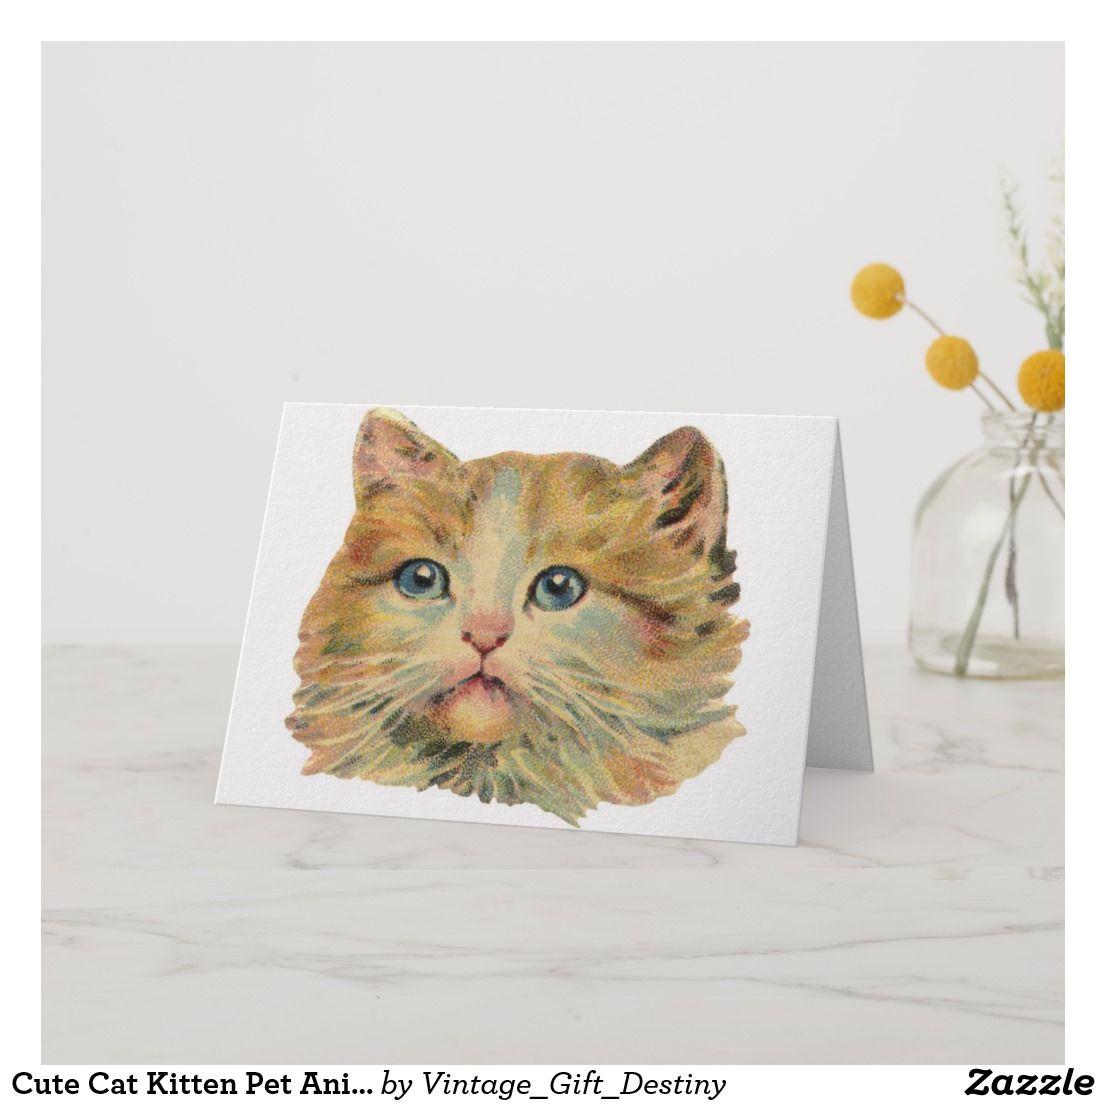 Cute Cat Kitten Pet Animal Feline Vintage Card Zazzle Com Cats And Kittens Cute Cat Vintage Cards